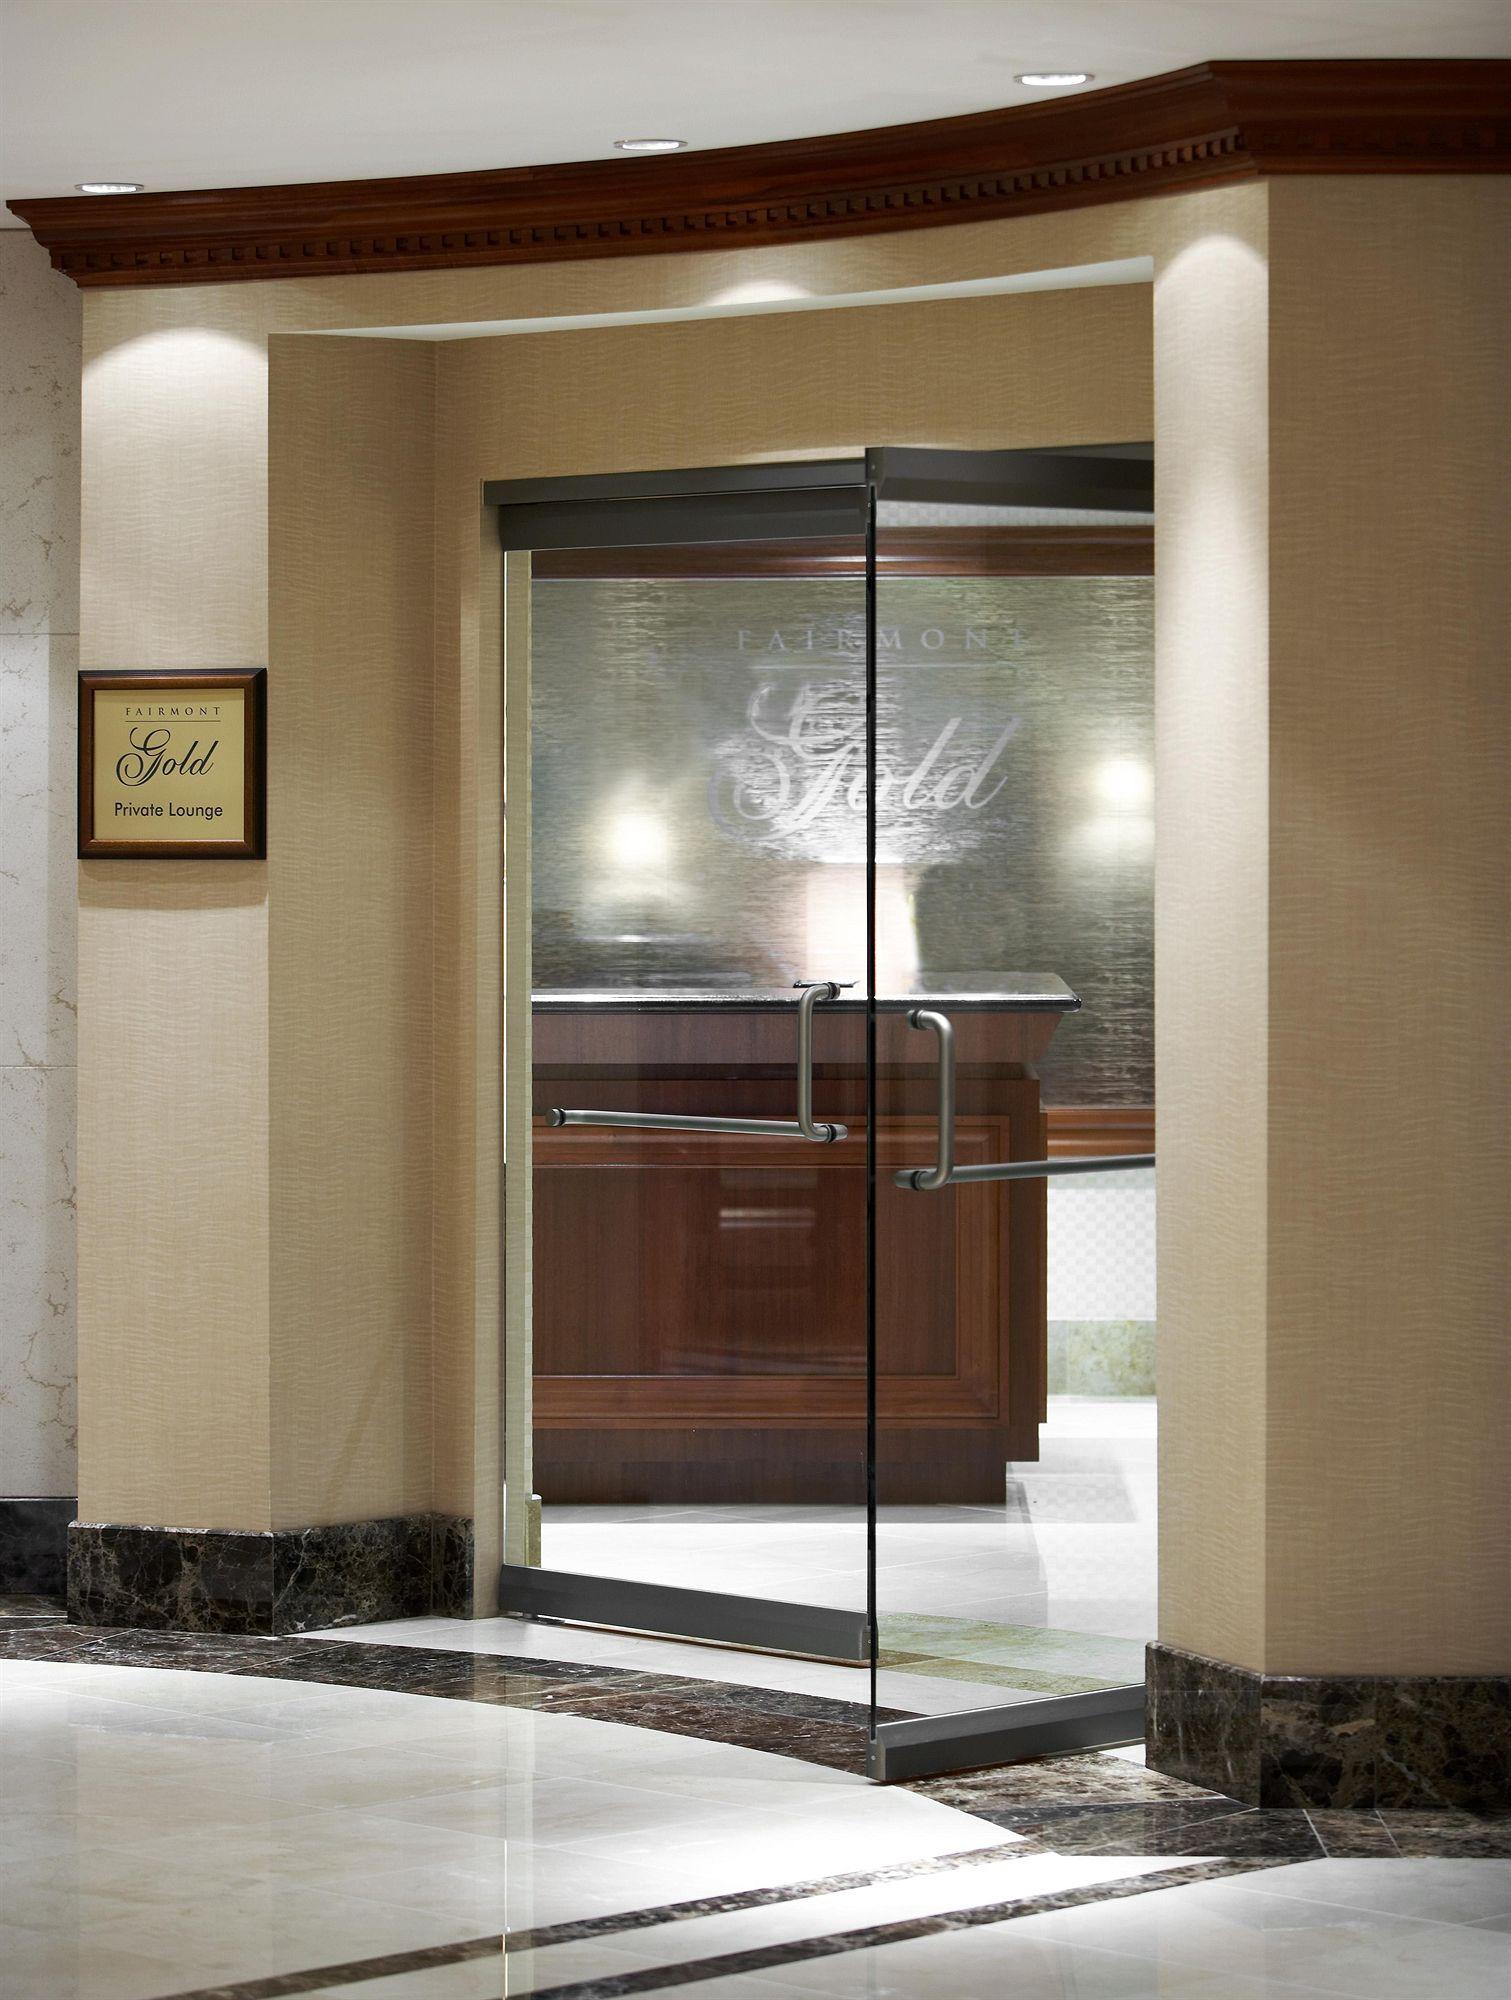 Newport Beach Hotel Coupons For Newport Beach, California